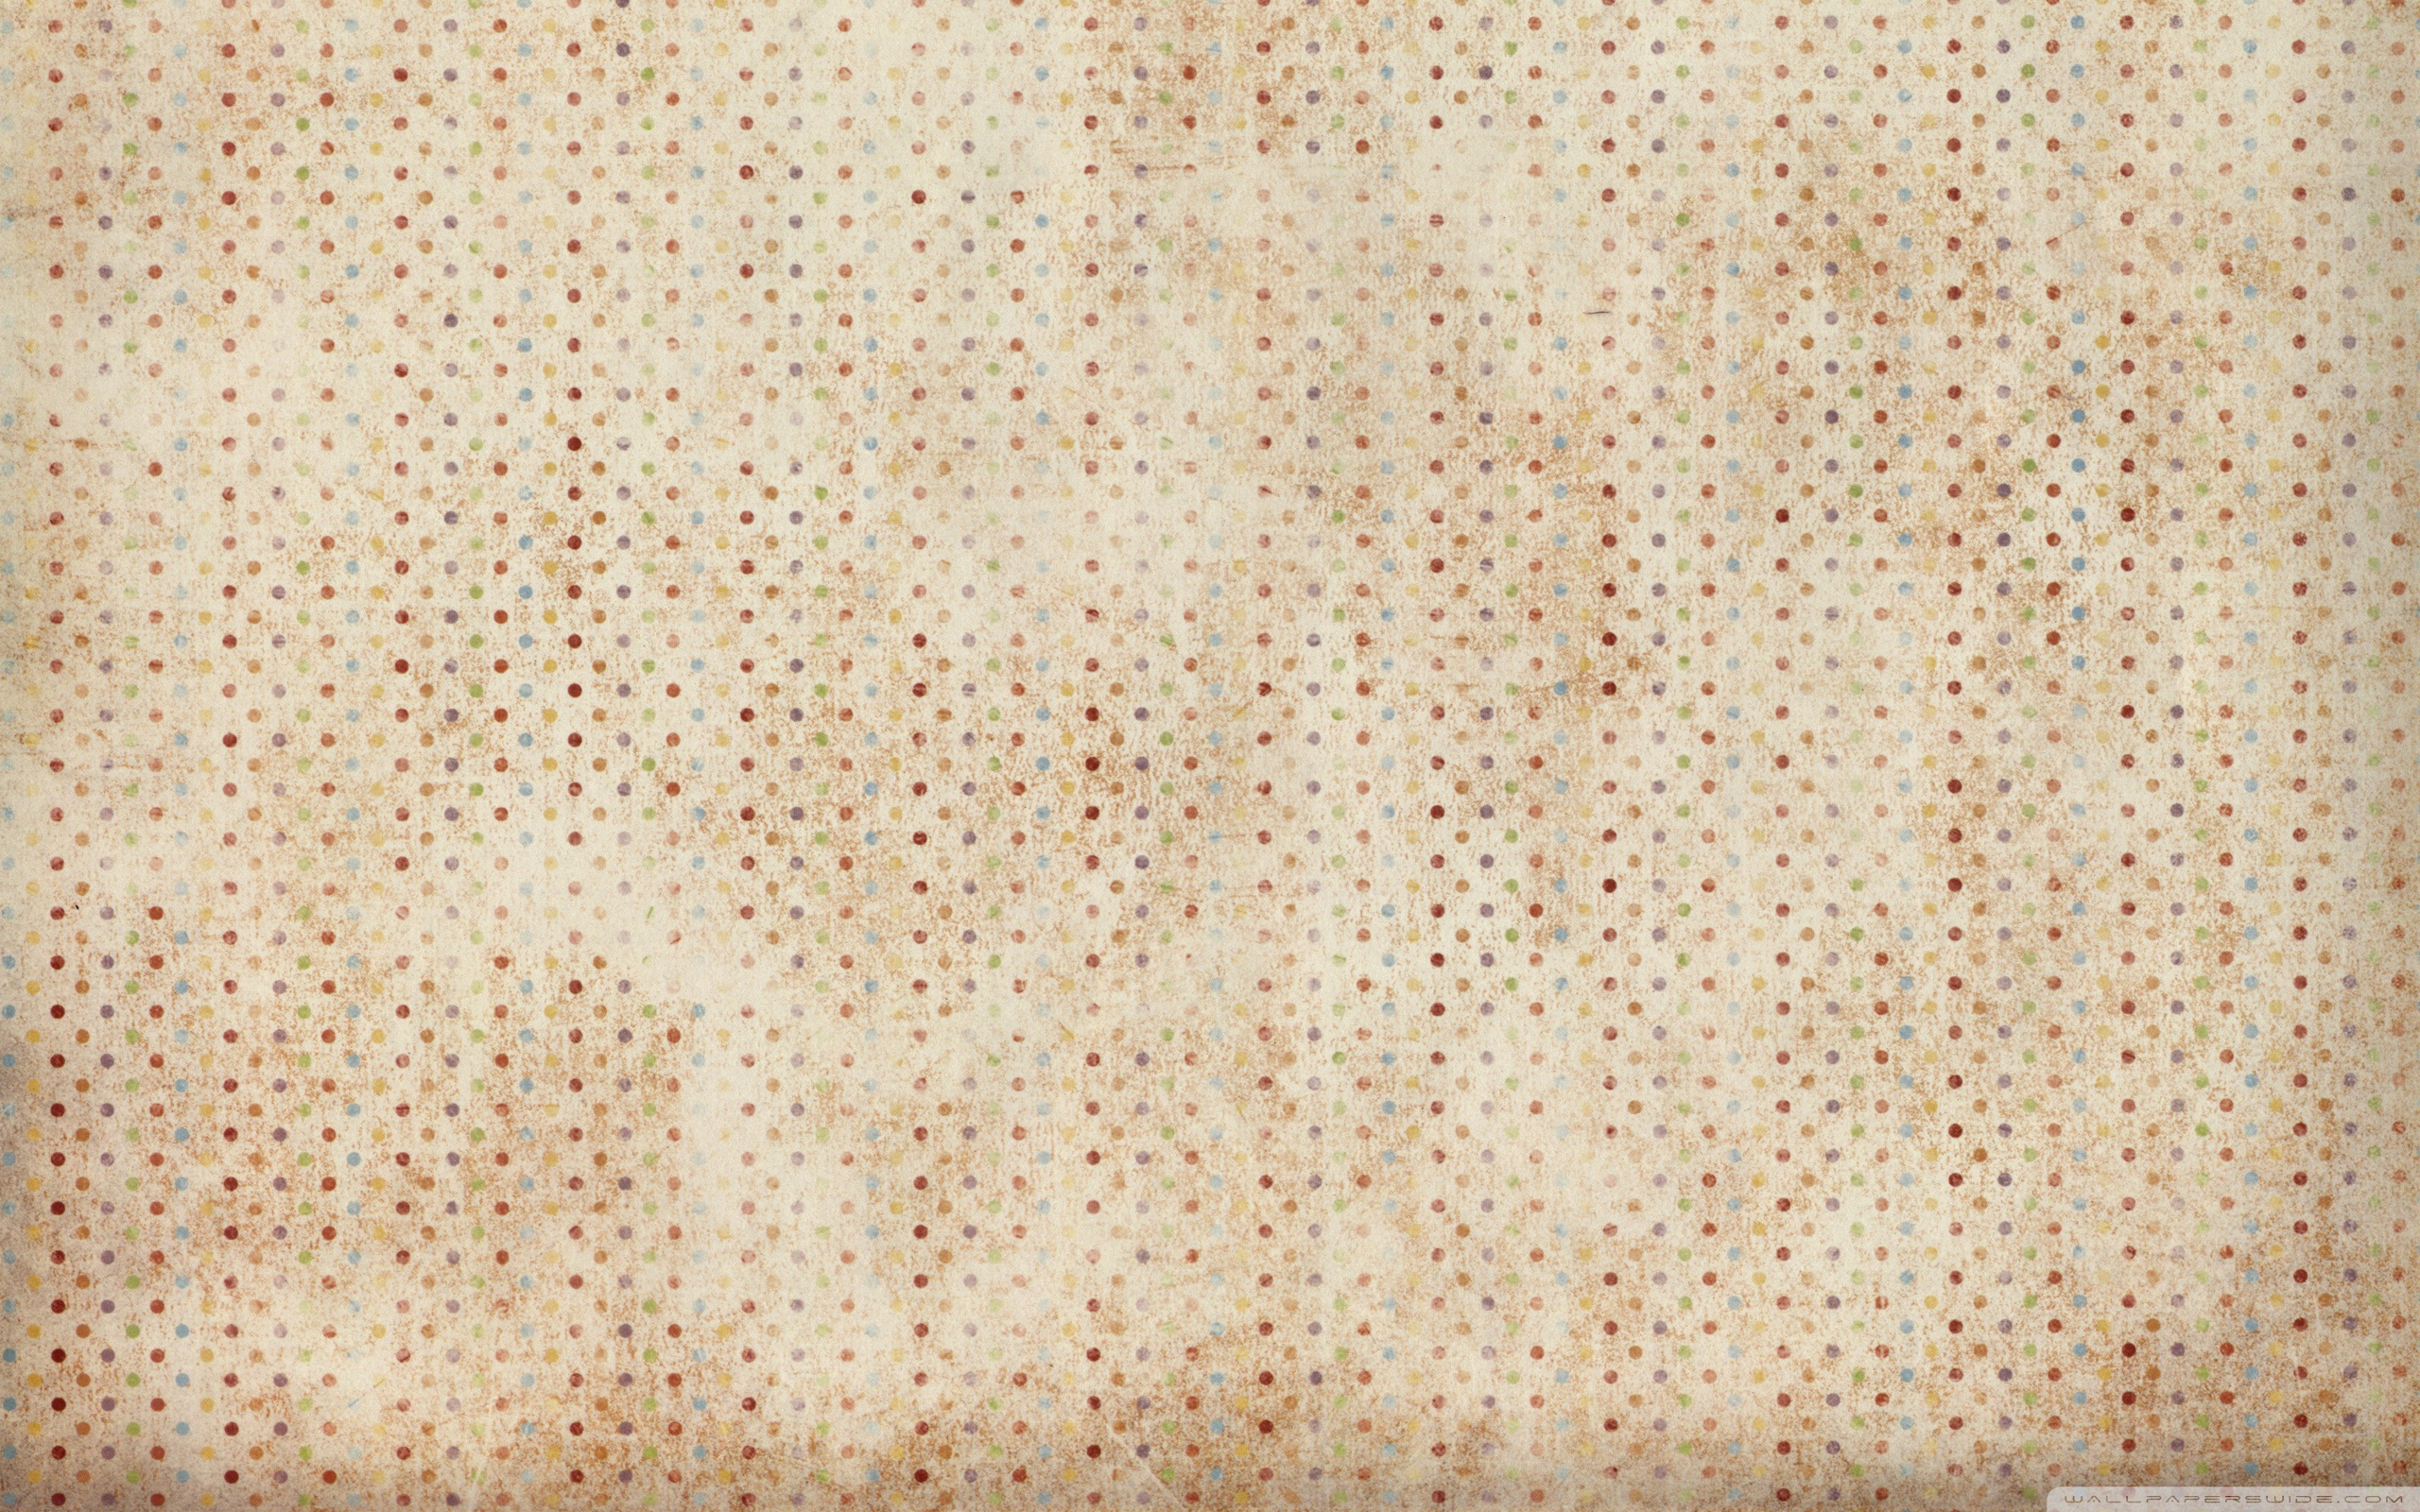 Free Download Vintage Wallpaper Texture Fond Ecran Hd 2560x1600 For Your Desktop Mobile Tablet Explore 49 Vintage Wallpaper Vintage Wallpaper Background Vintage Wallpaper For Sale Vintage Wallpaper Canada